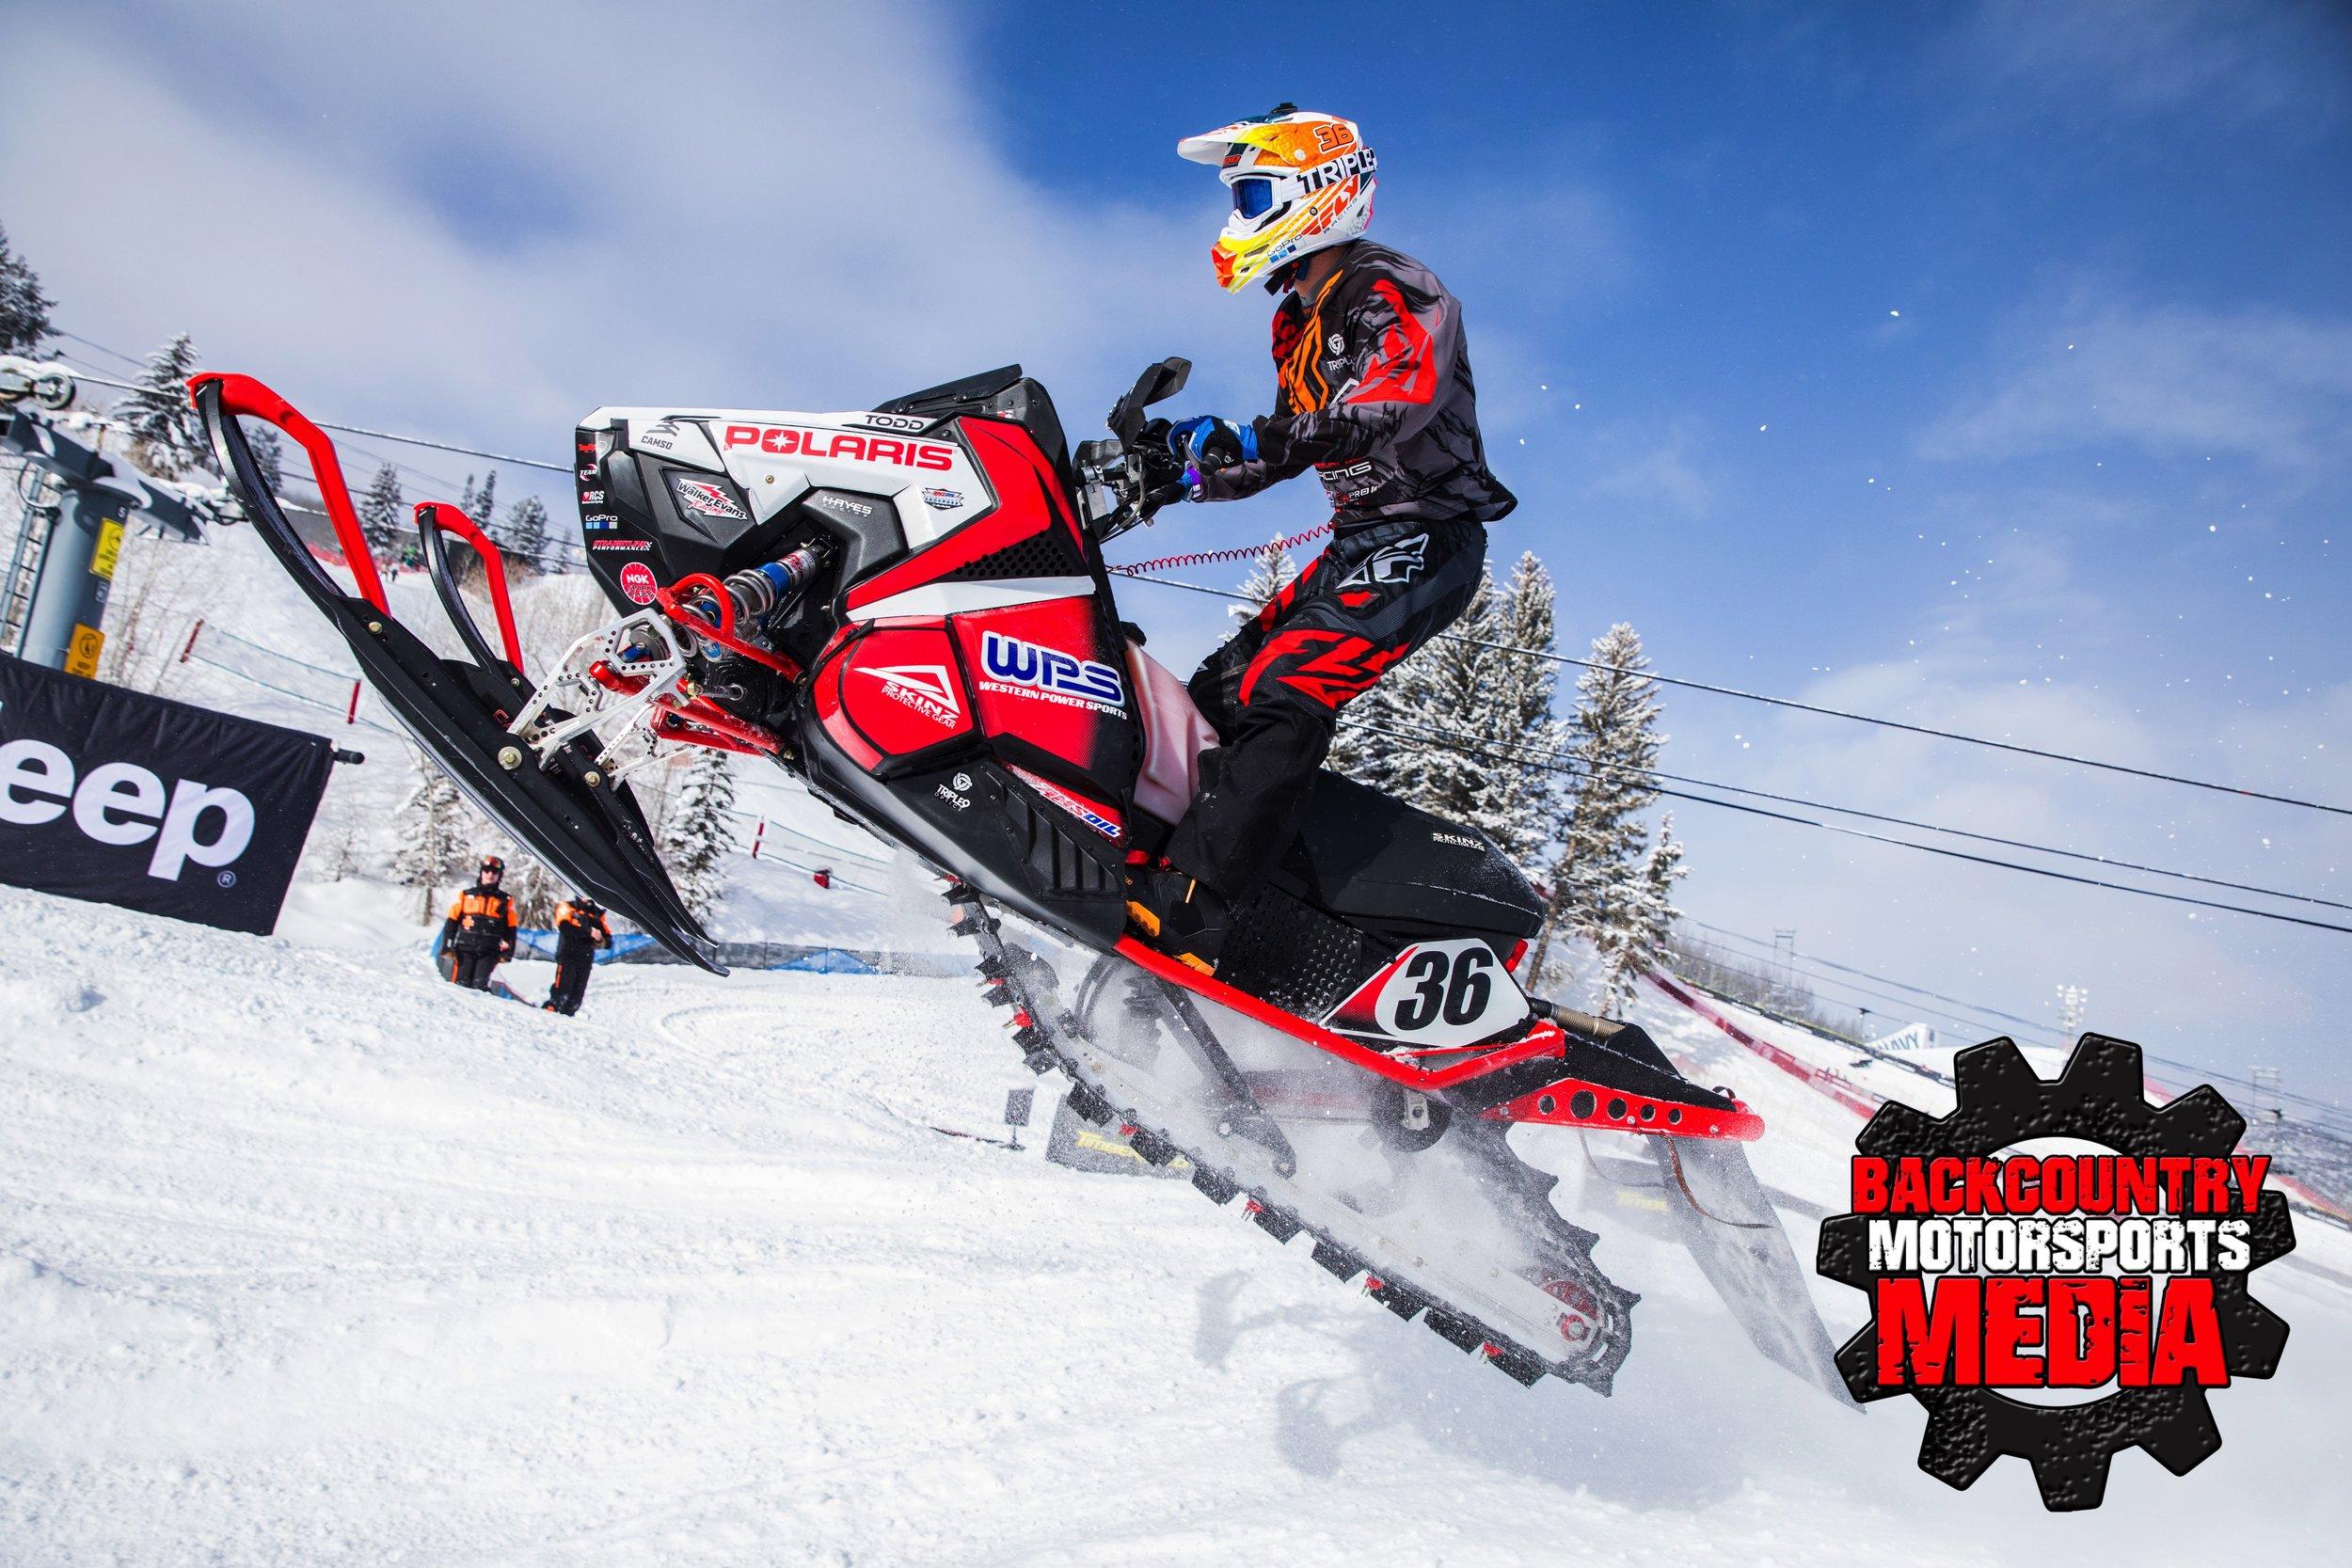 Winter X Games 2017 - Snocross